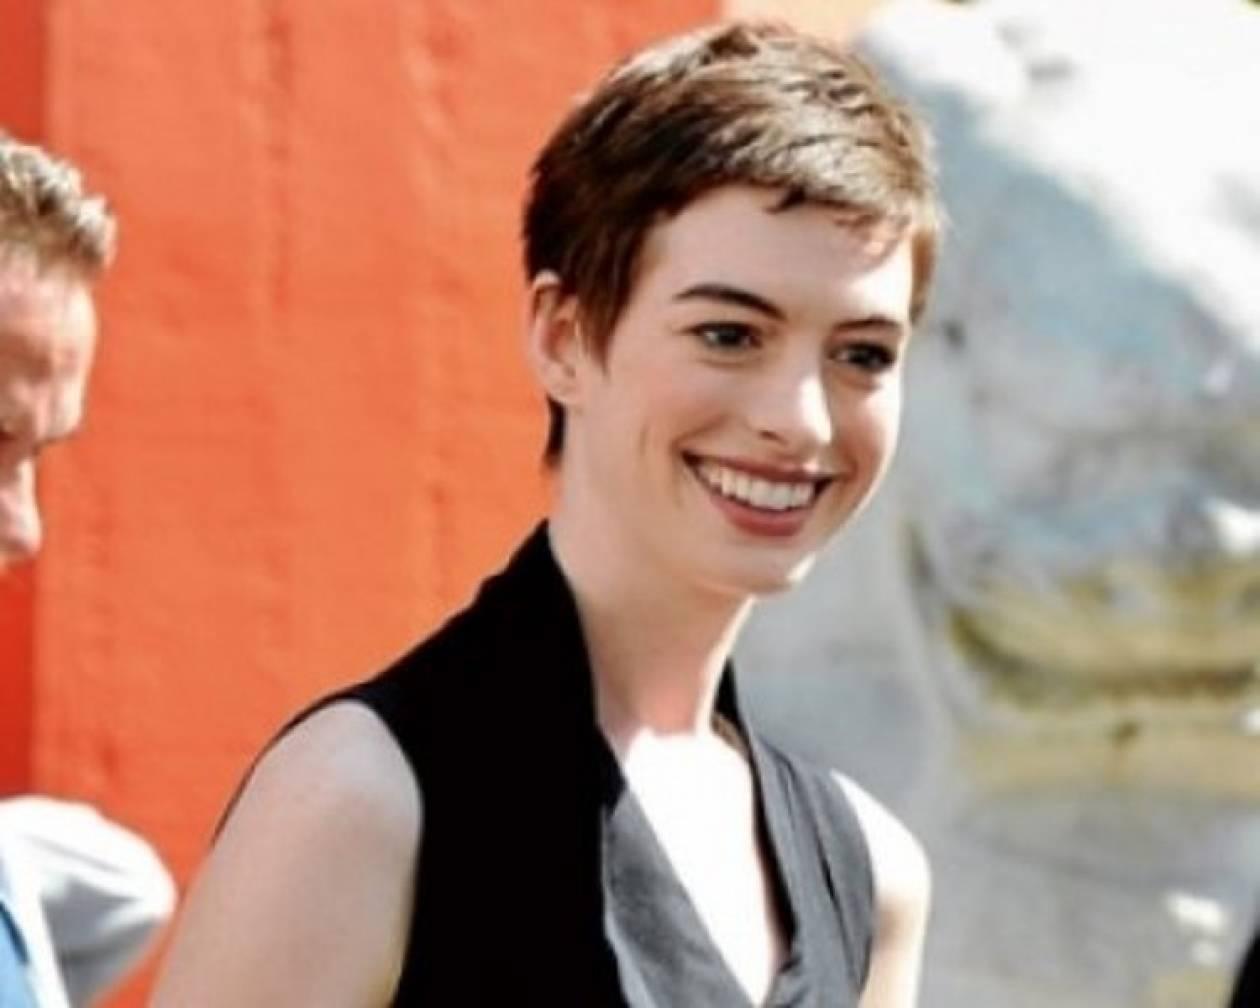 Anne Hathaway: Αν και έχασε 12 κιλά ακόμη ανησυχεί για το βάρος της